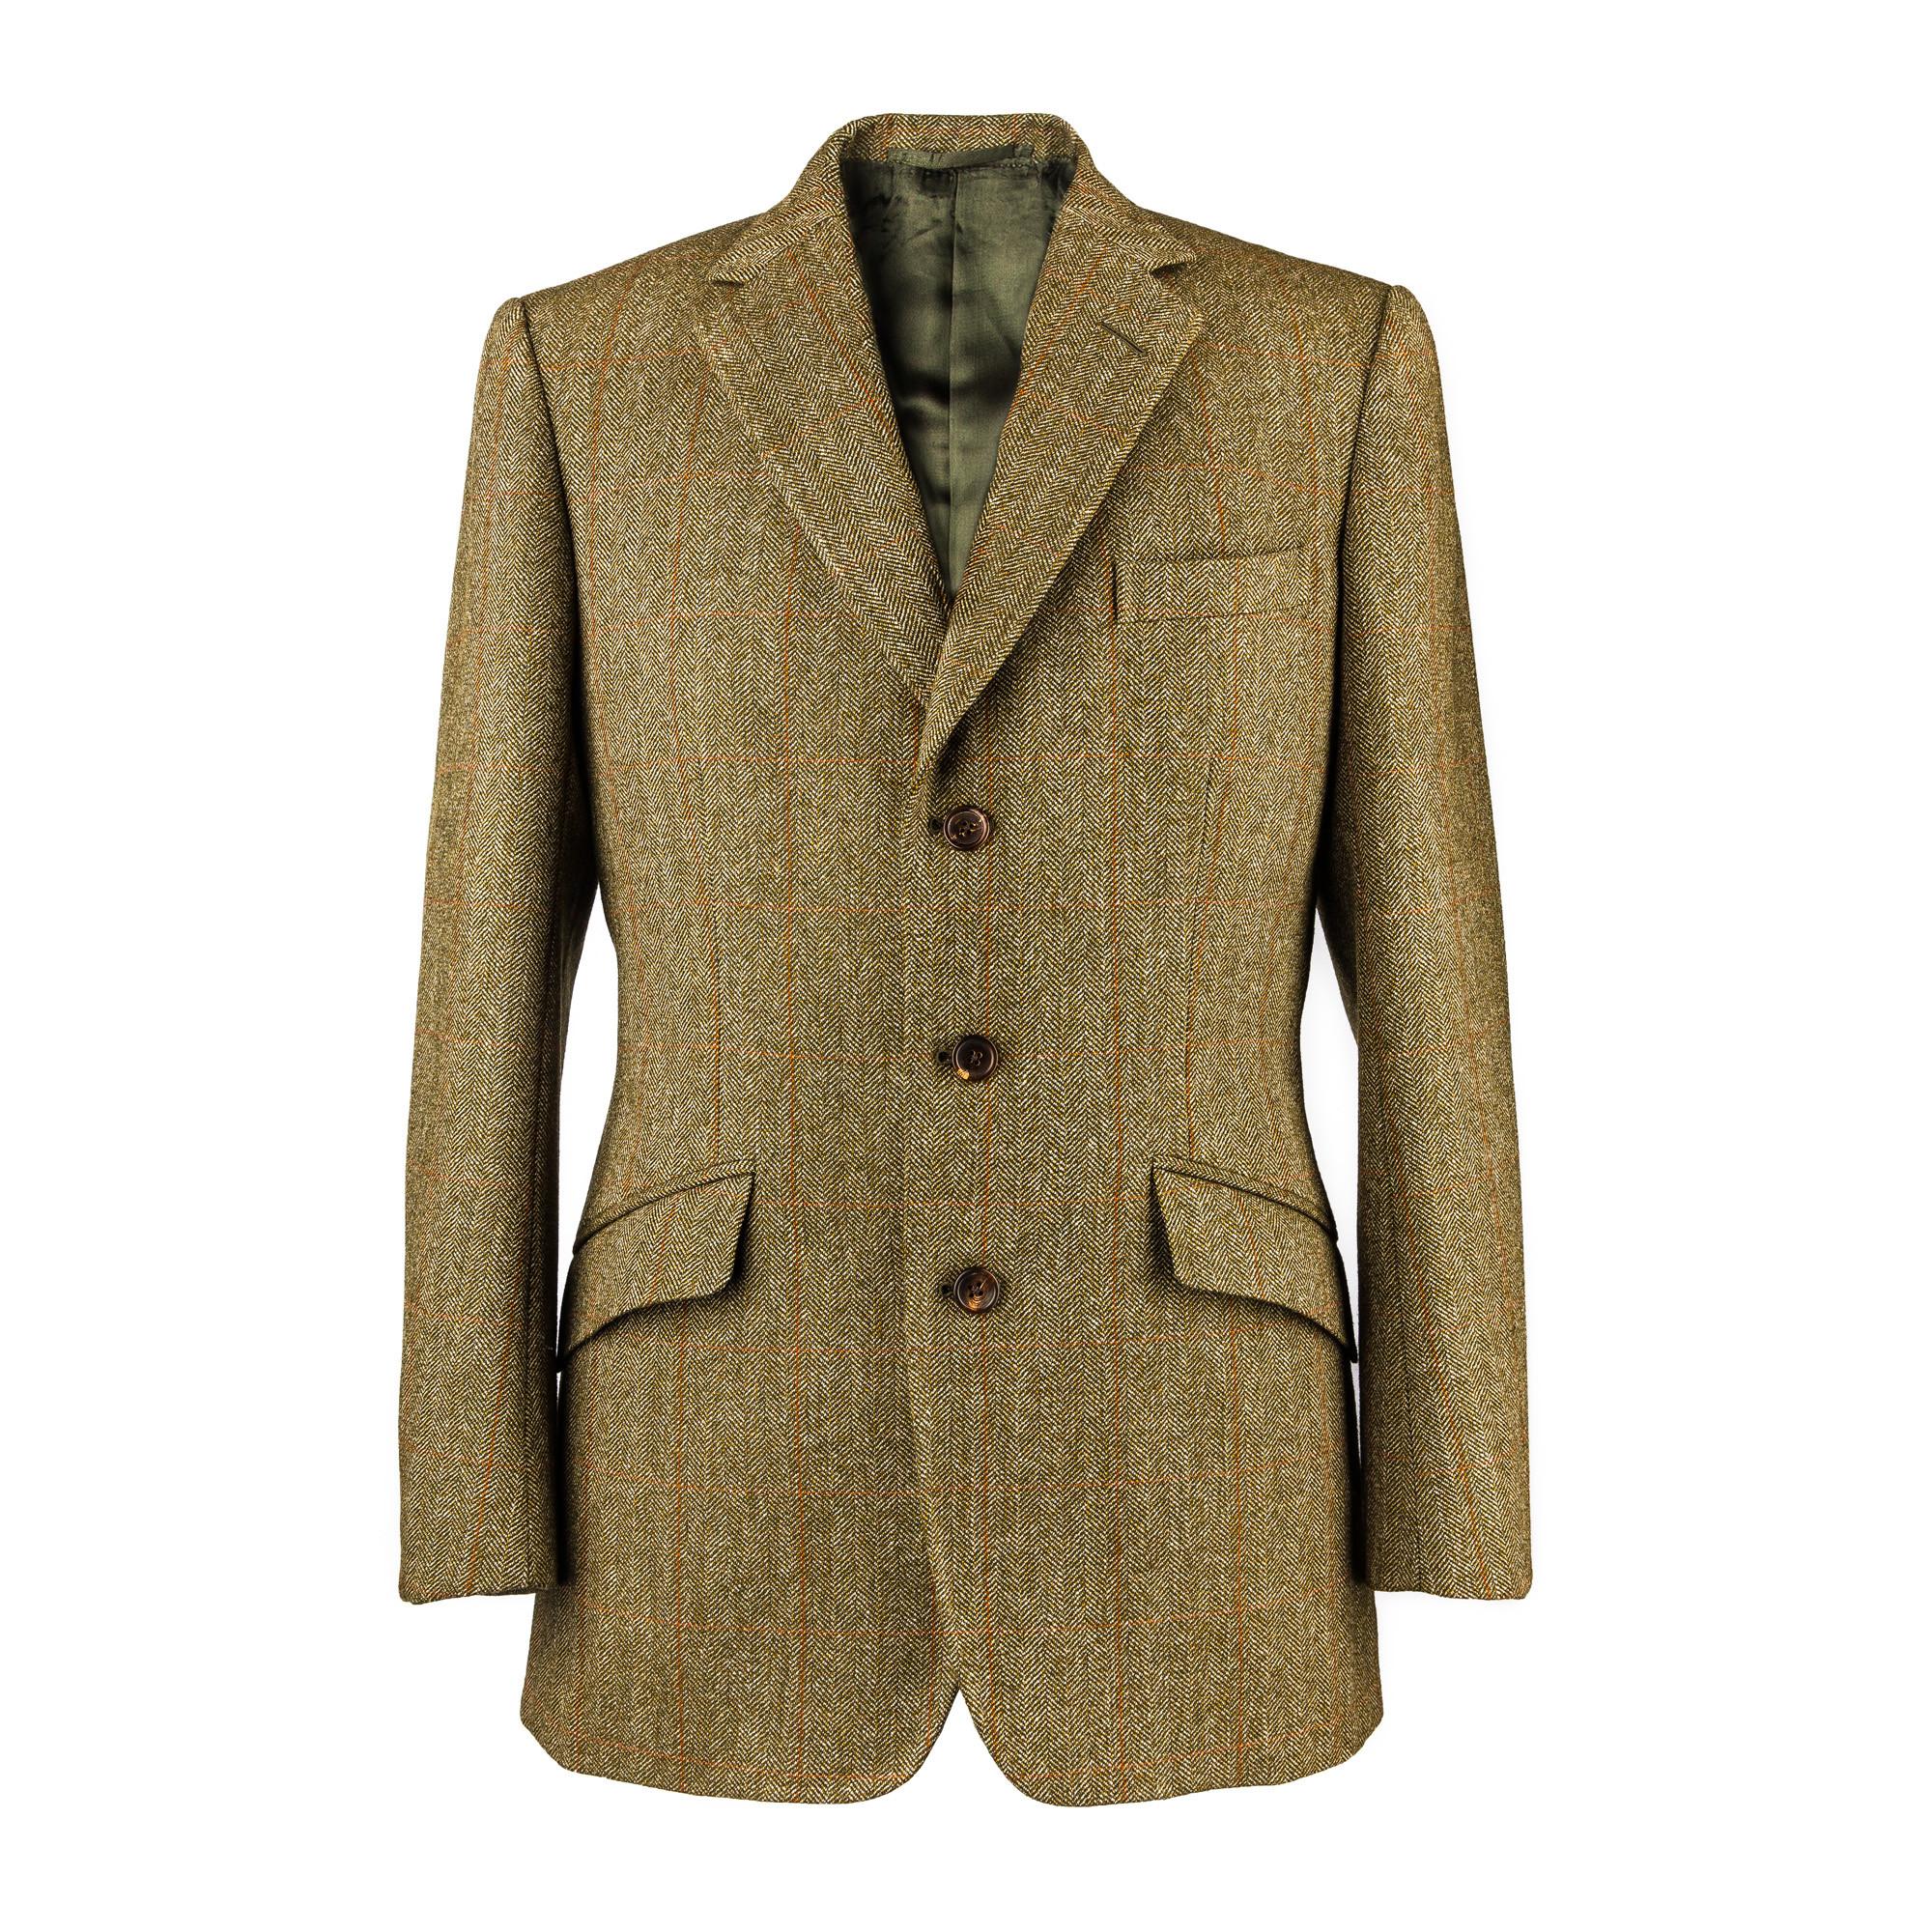 Westley Richards Tweed Shooting Jacket